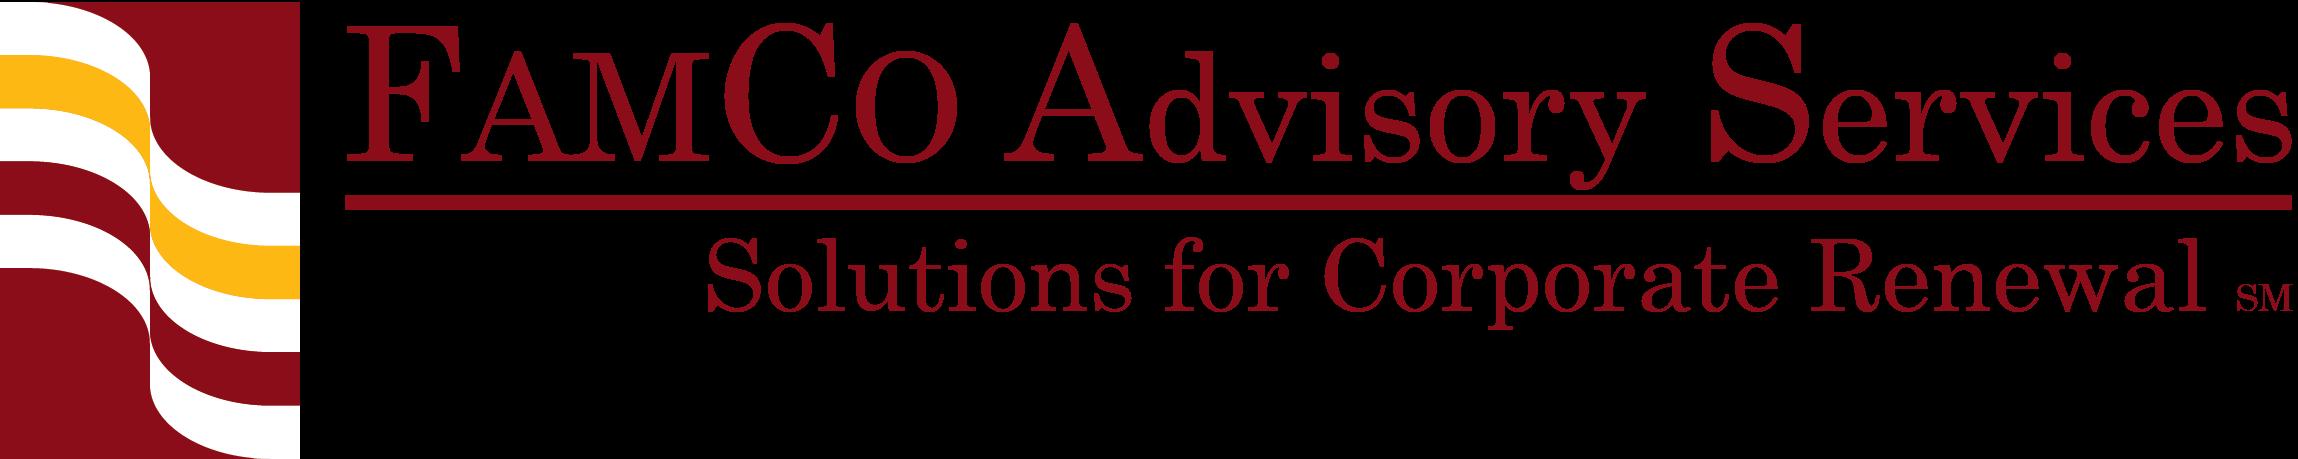 FamCo Advisory Services